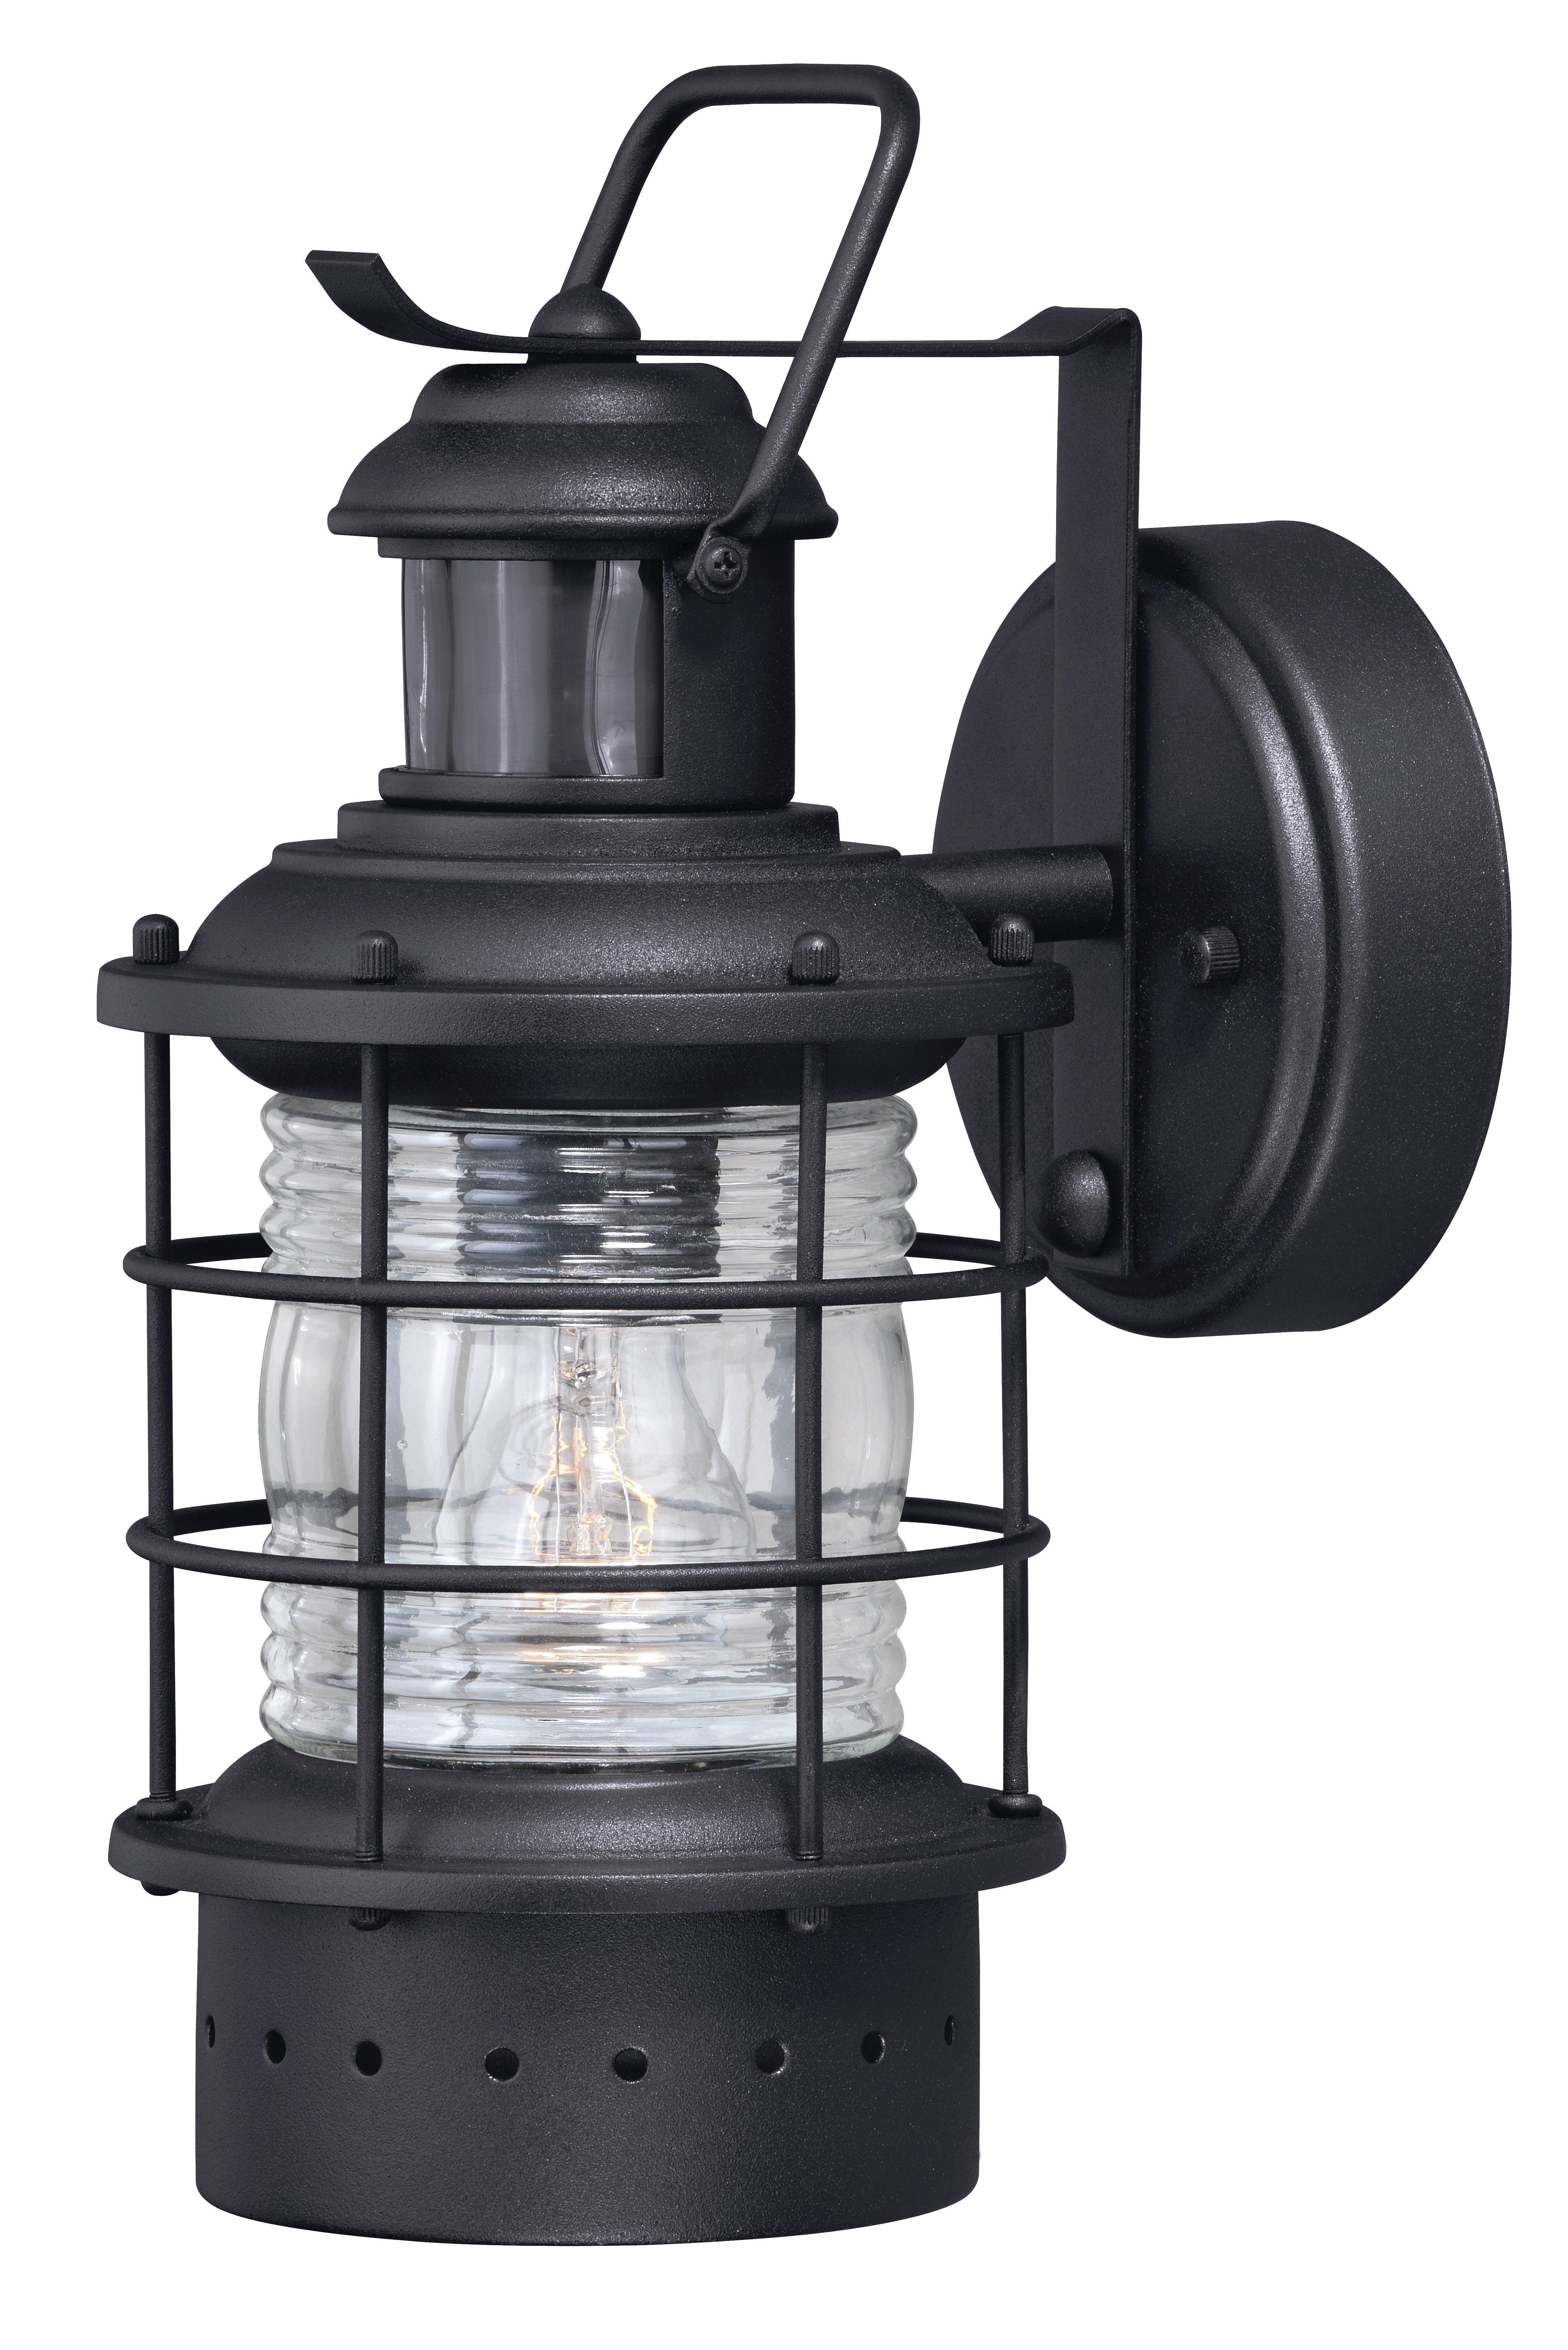 Beachcrest Home Stimson Modern Outdoor Wall Lantern With Motion Sensor Reviews Wayfair